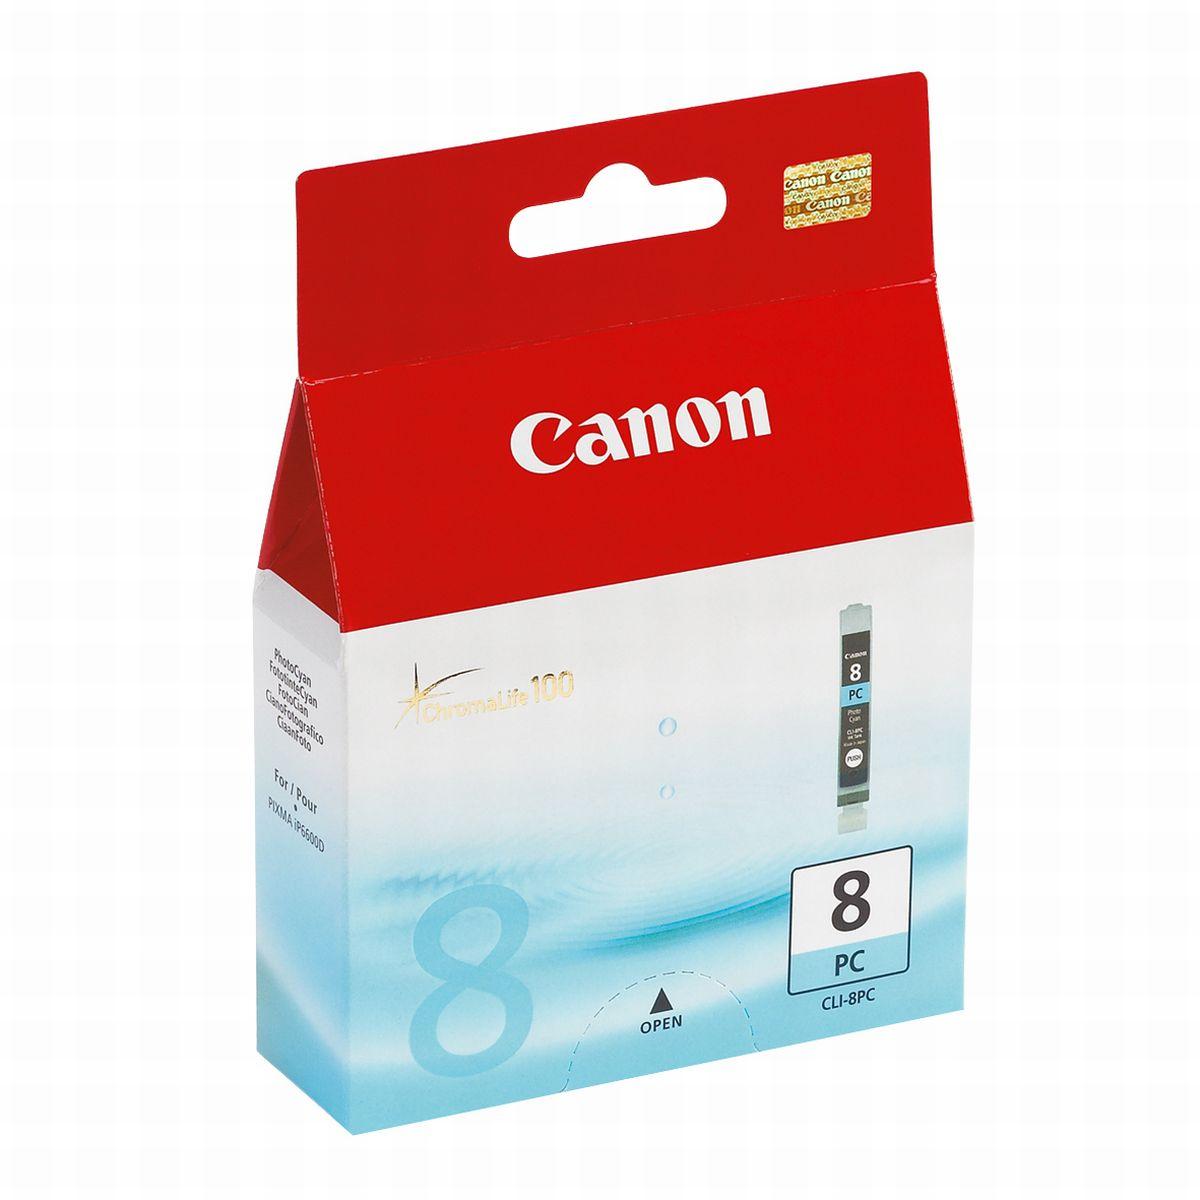 Cartucho Canon Original CLI-8PC Photo Cyan